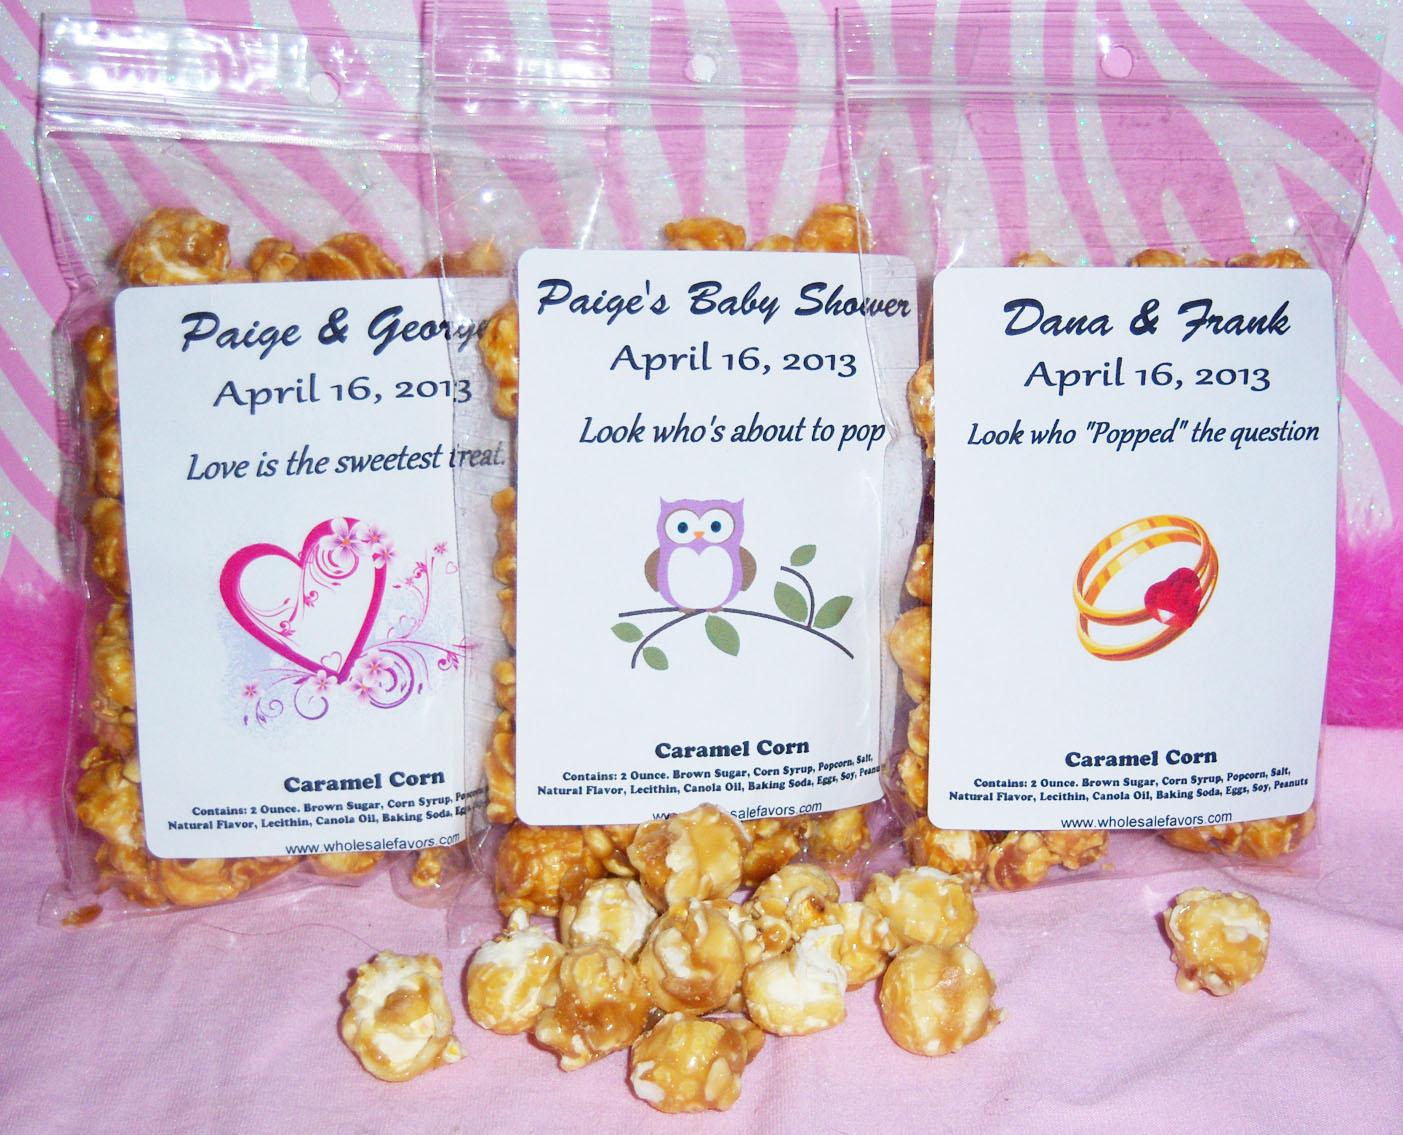 Bridalshowerfavors Announces New Edible Wedding Favors